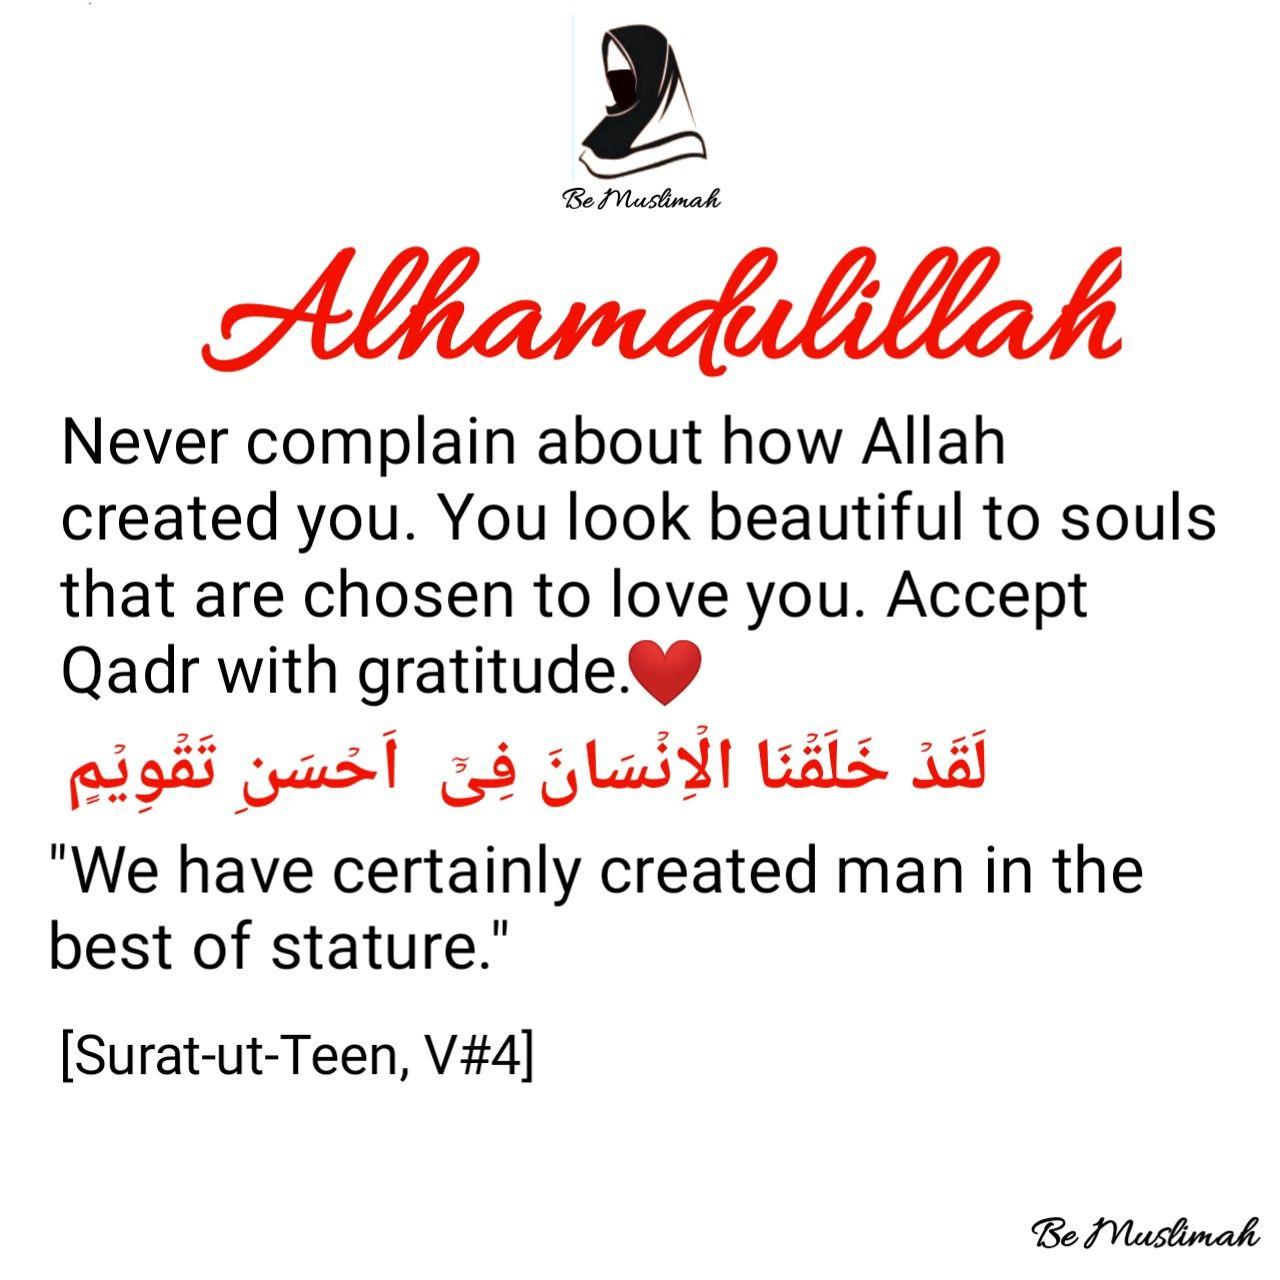 Alhamdulillah Alhamdulillah Muslimah Hadith